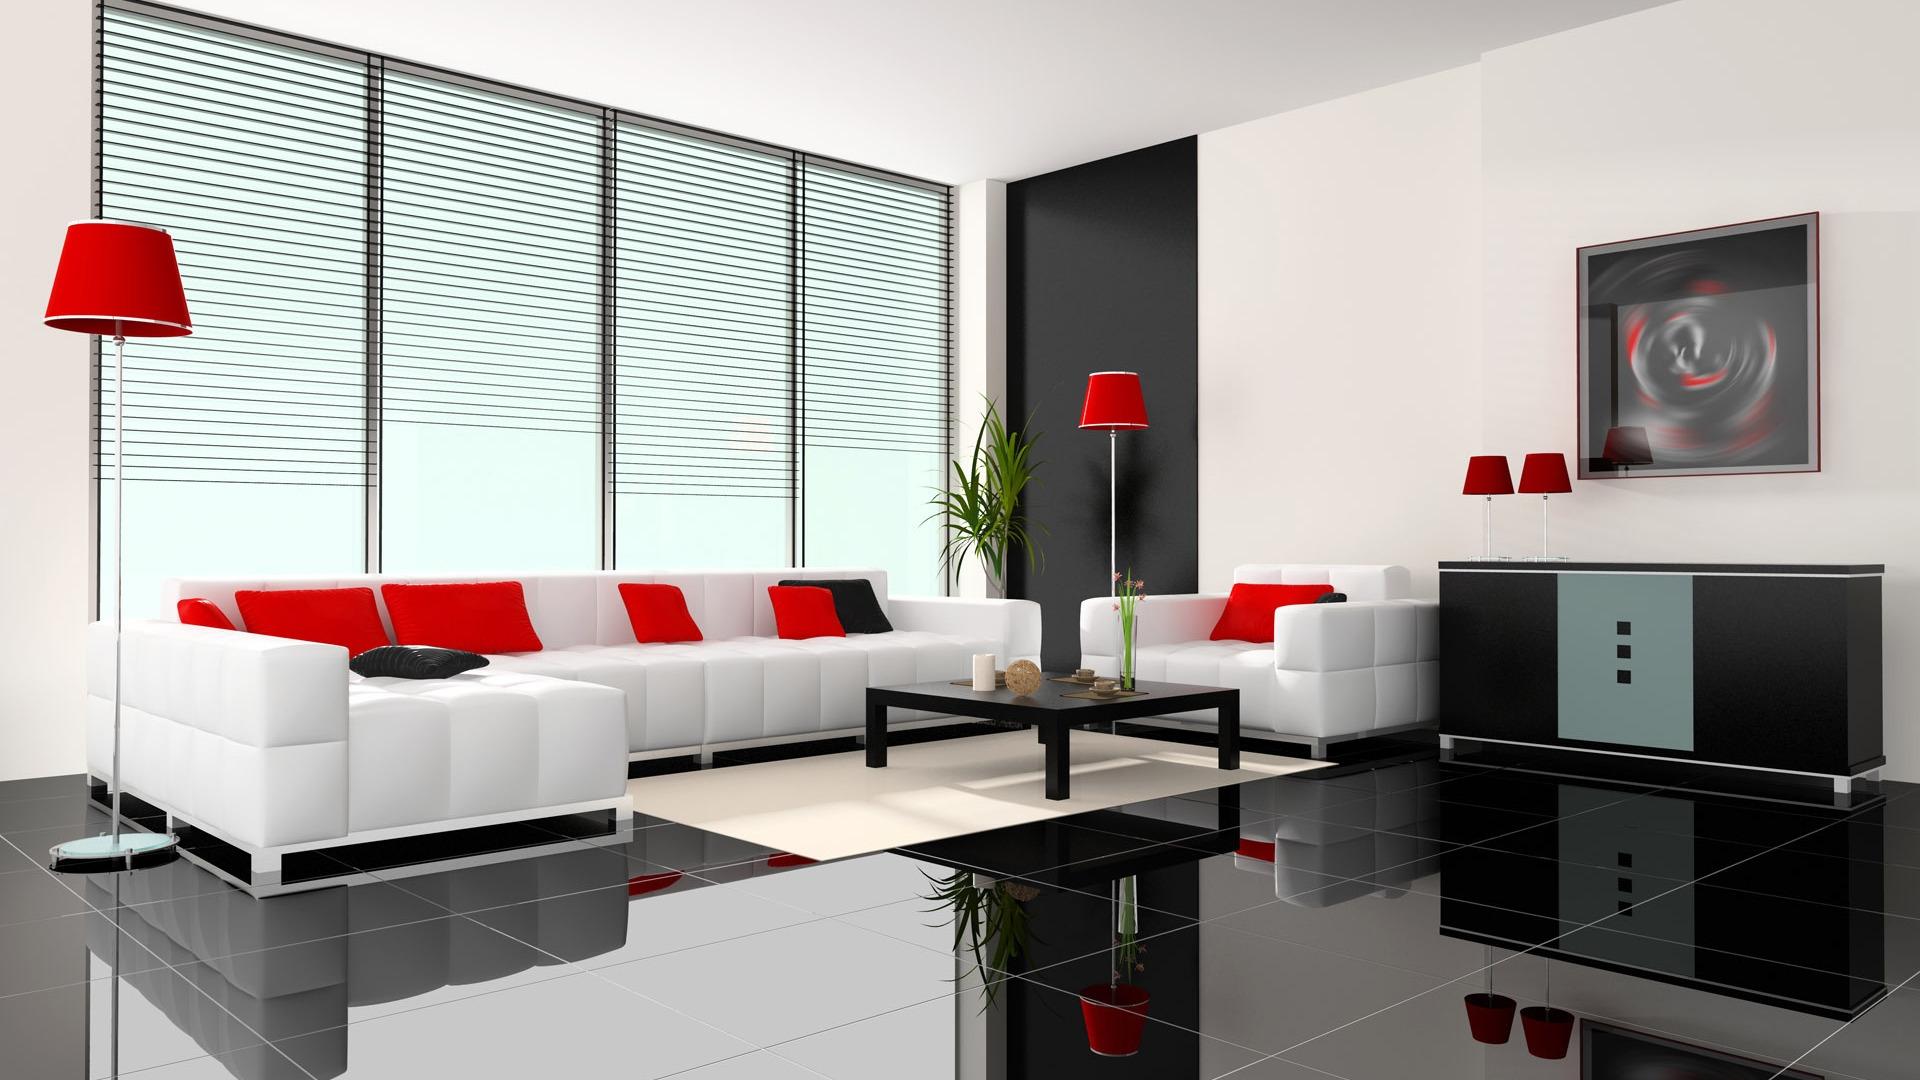 interior design hd wallpaper is one of Interior Design Ideas 1920x1080